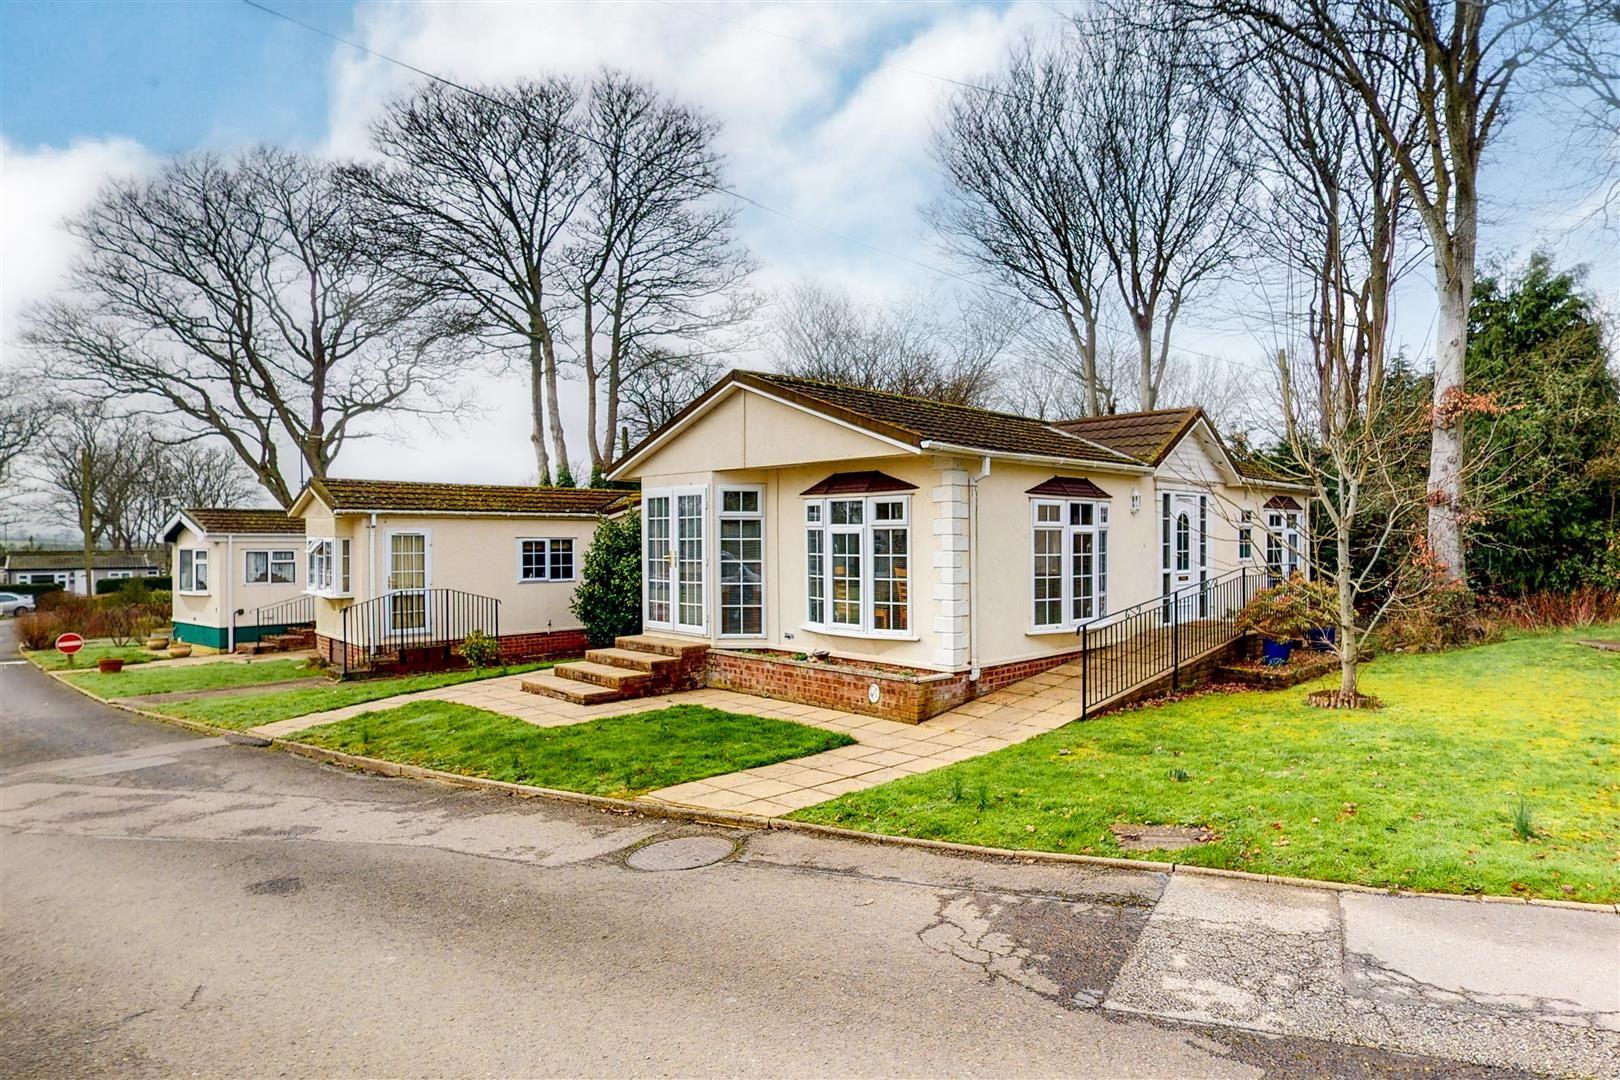 Property photo 1 of 19. Psx_20210208_163121.Jpg